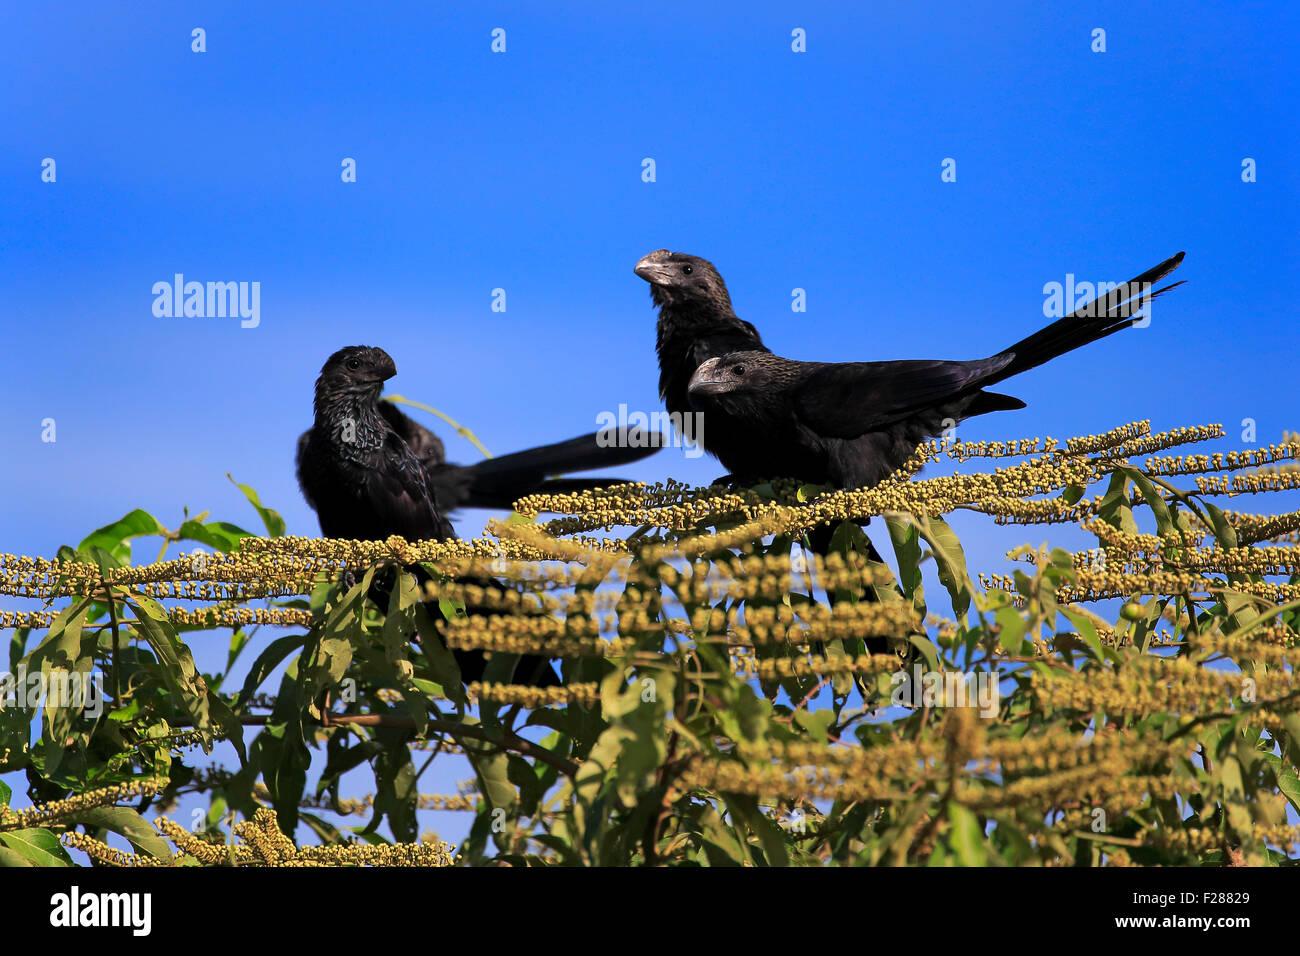 Smooth-billed anis (Crotophaga ani), sitting on a tree, group, Pantanal, Mato Grosso, Brazil - Stock Image